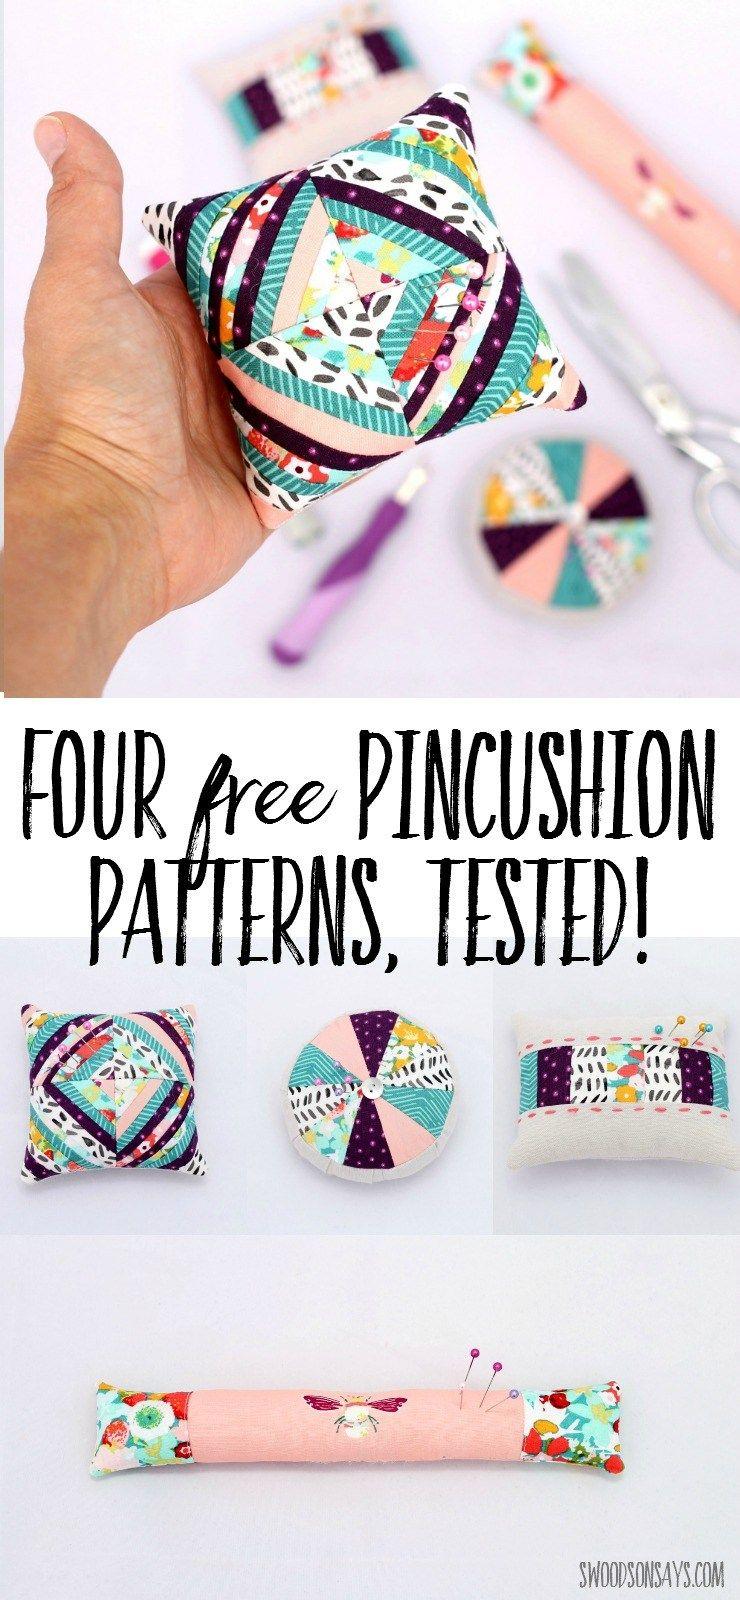 4 Free Pincushion Sewing Tutorials - Tested